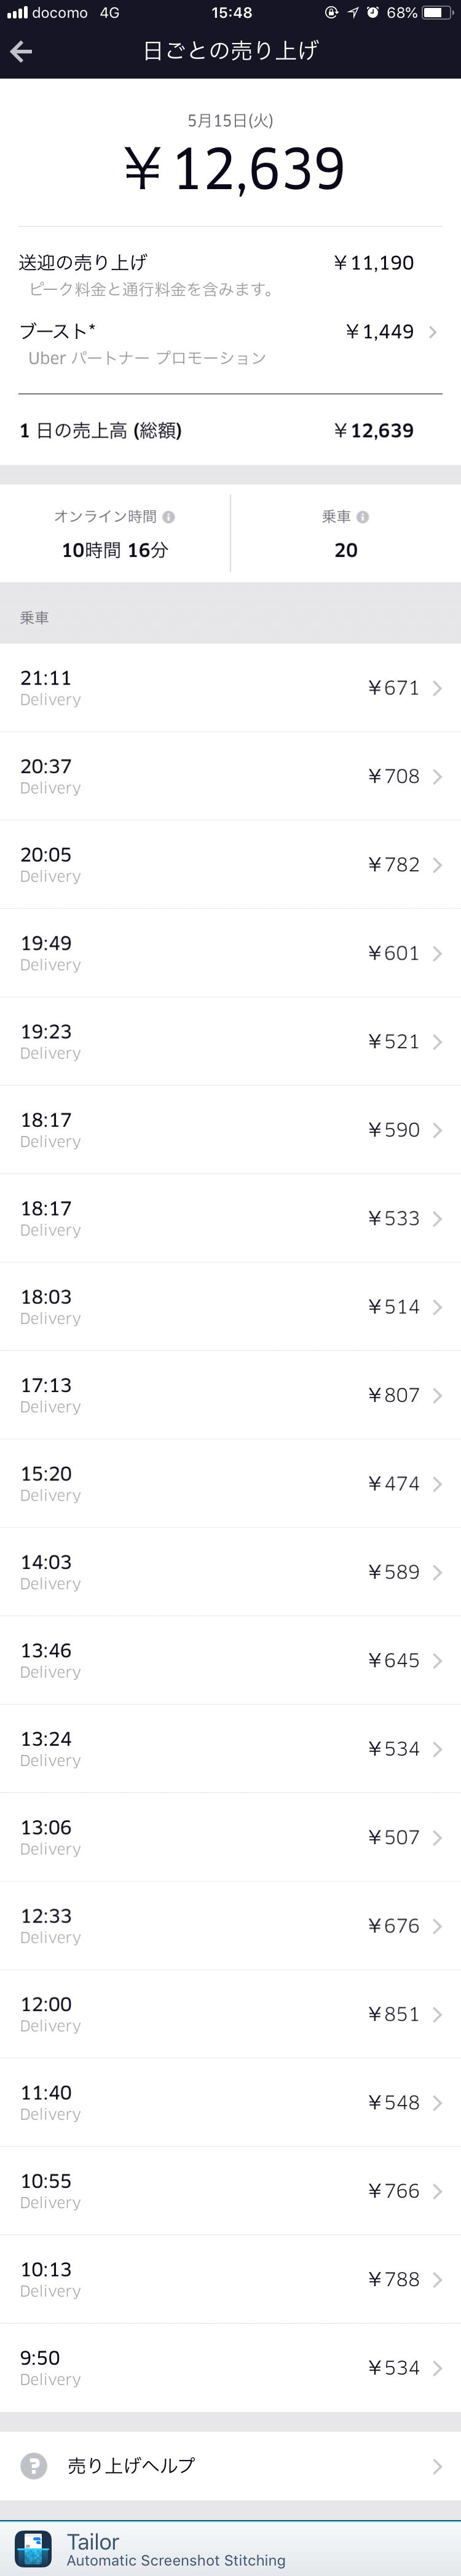 Uber Eats5月15日の配達記録